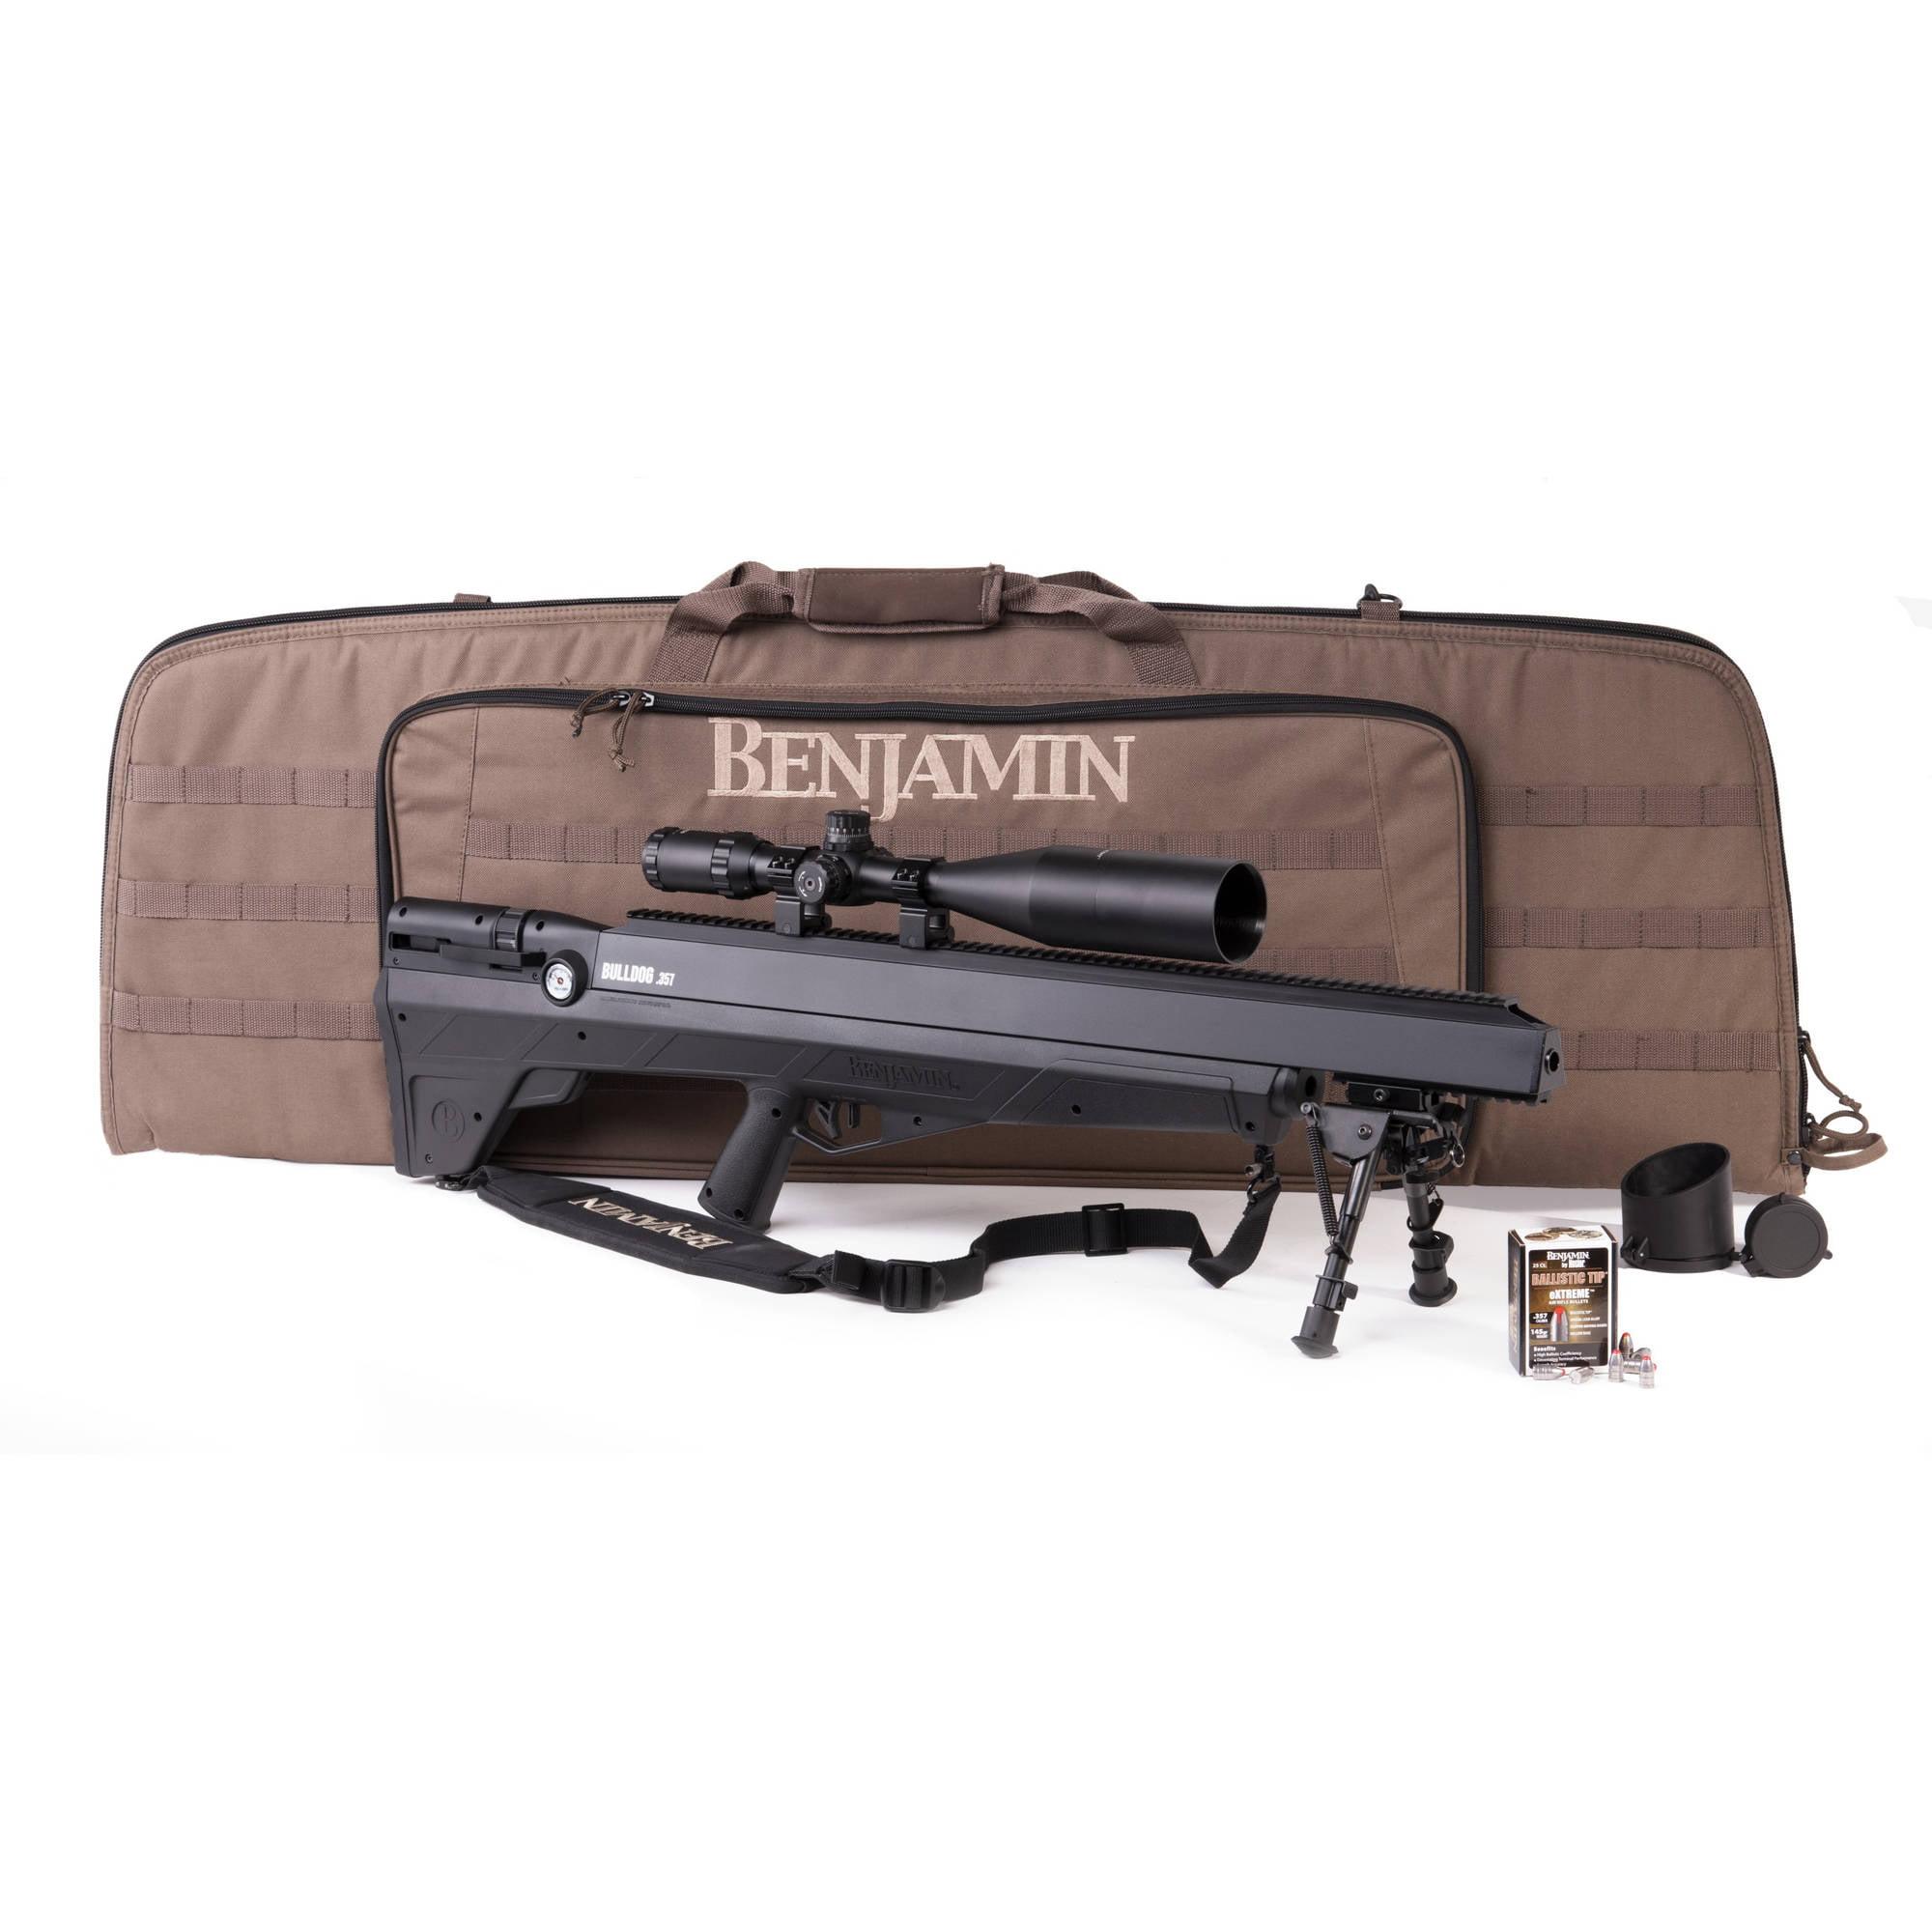 Benjamin Bulldog .357 Caliber PCP Air Rifle, Sportsman's Package